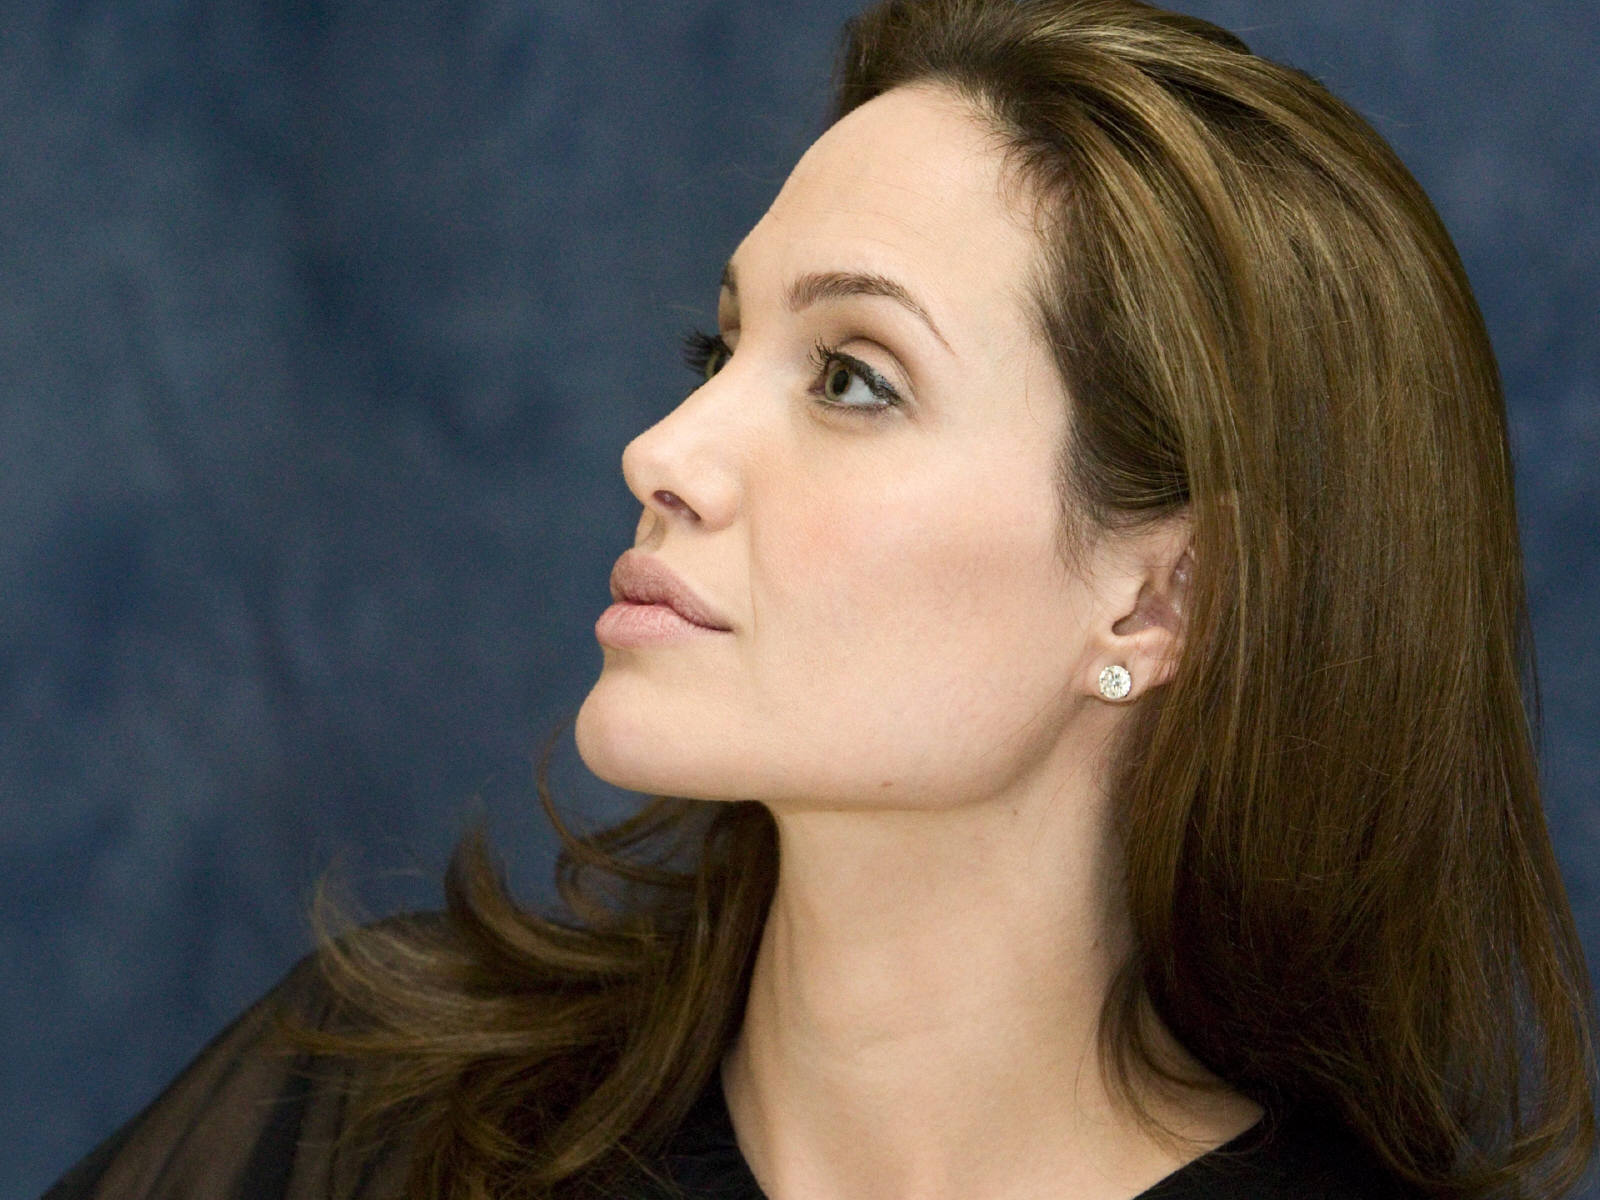 Angelina Jolie Hd Wallpapers: HD Wallpepars: Angelina Jolie HD Wallpapers(3